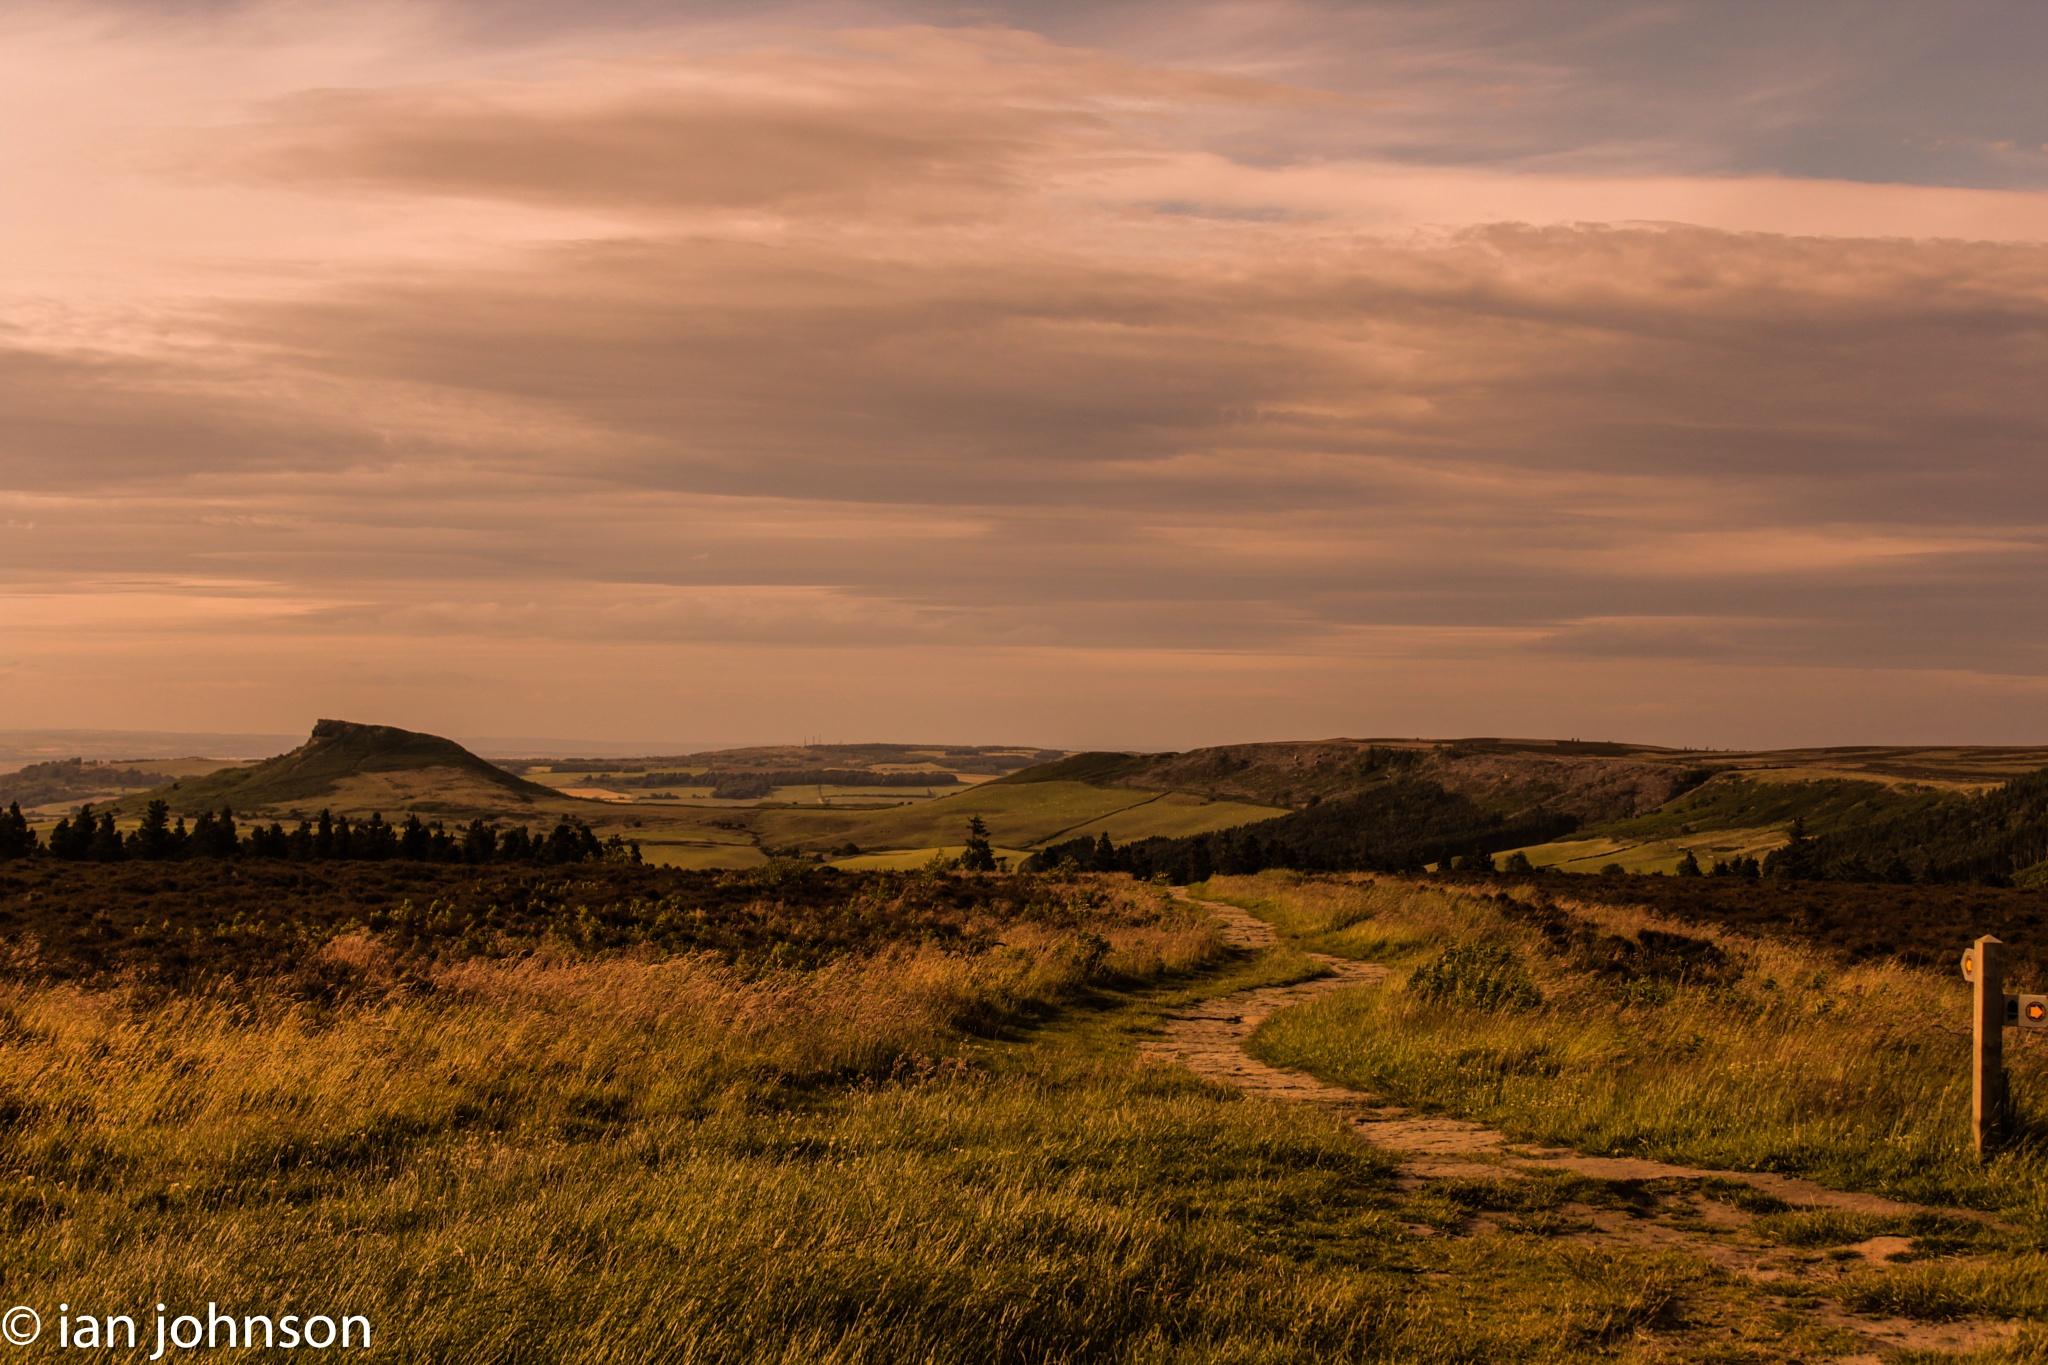 Rosebury Topping by Ian Johnson